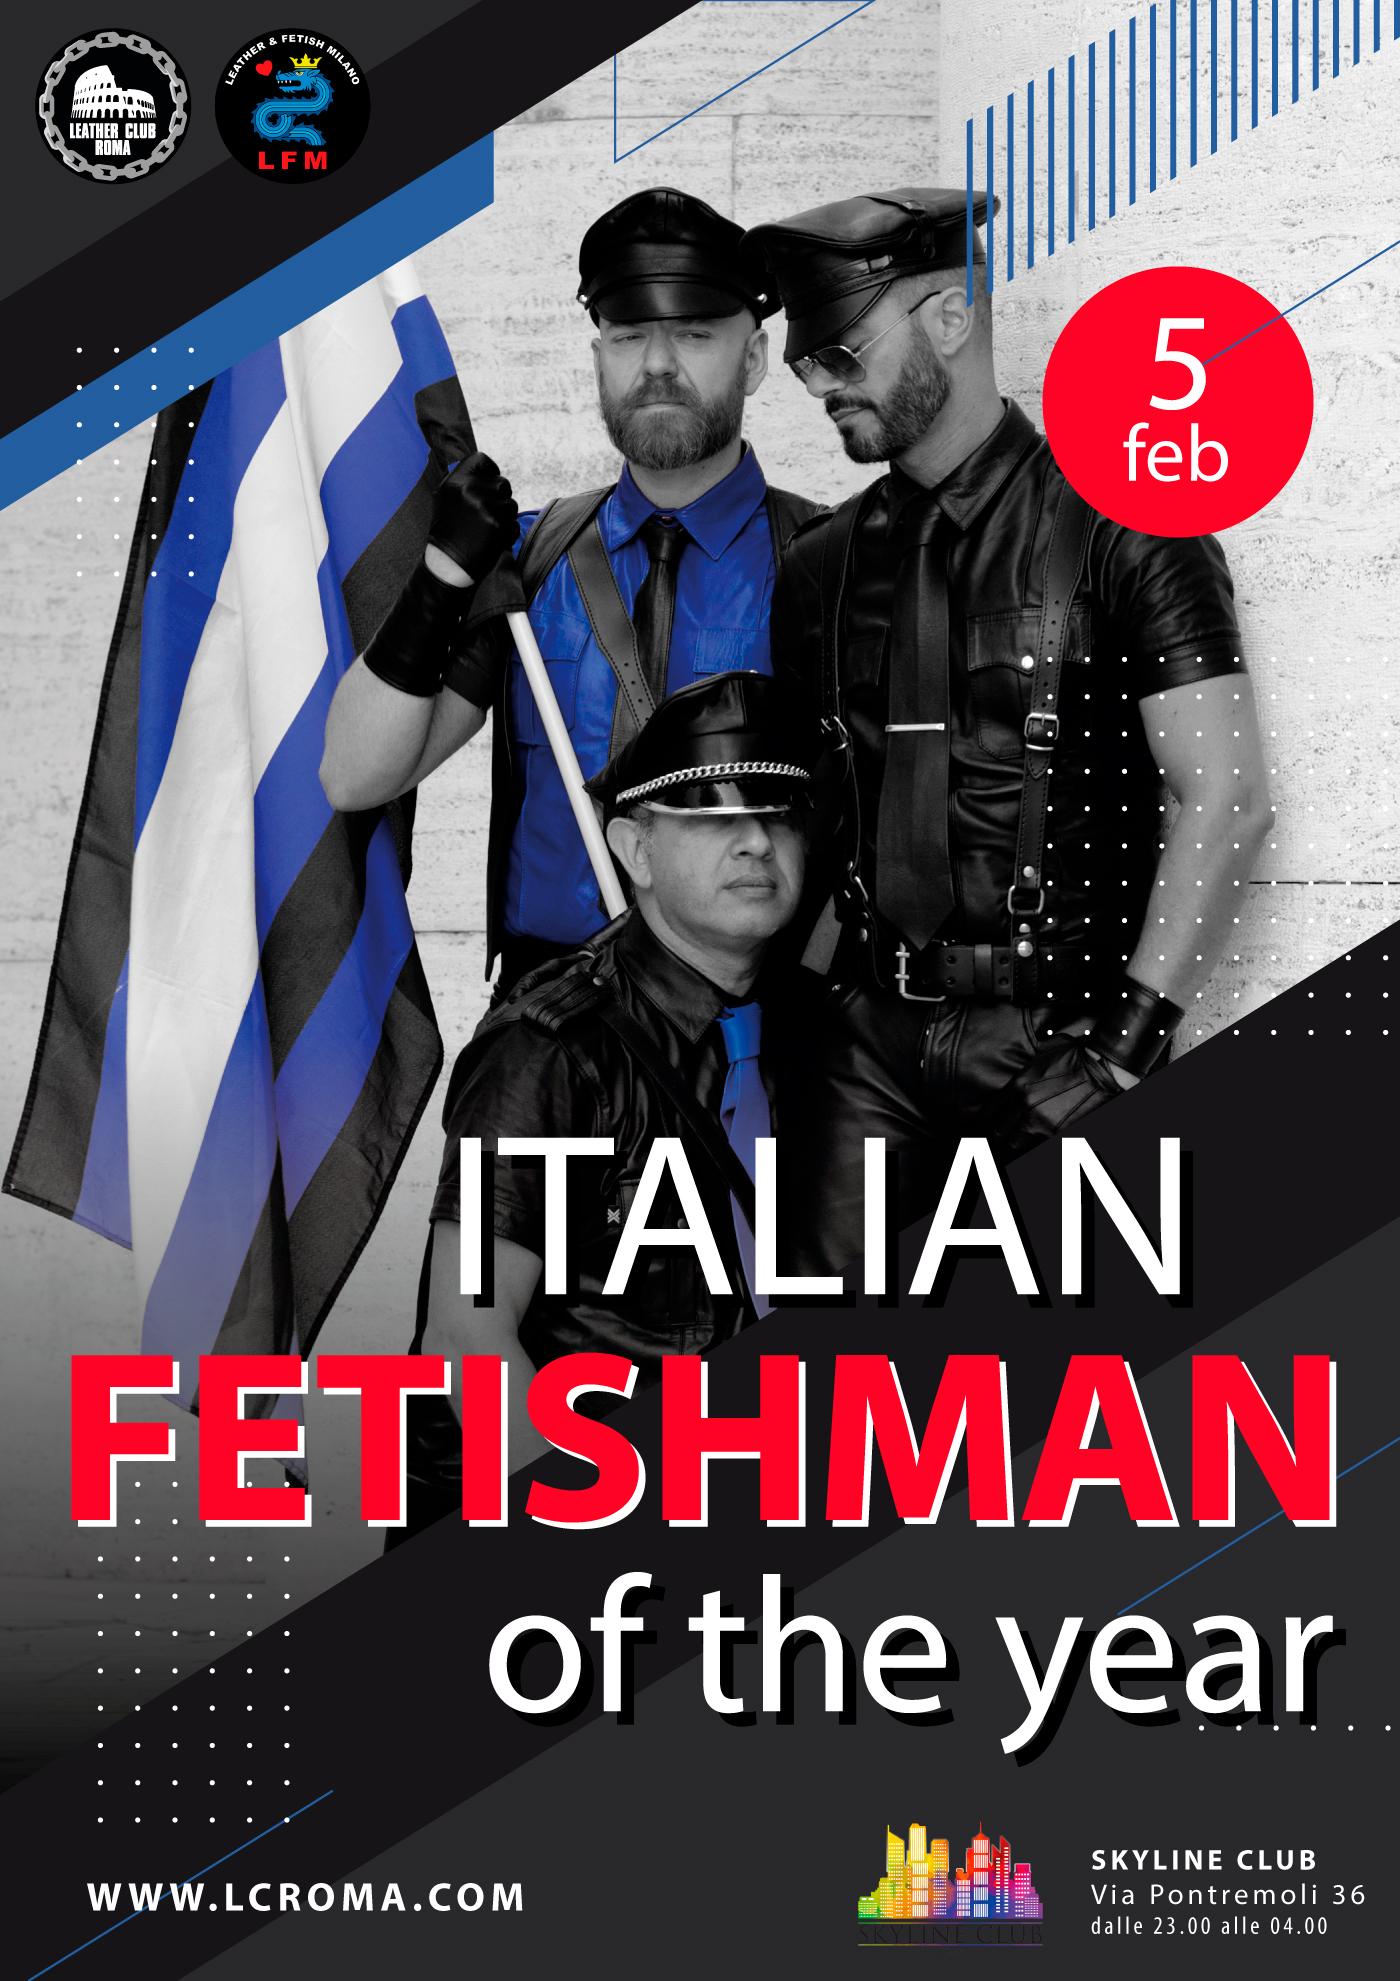 Italian-Fetishman-of-the-year---5-febbraio-2022